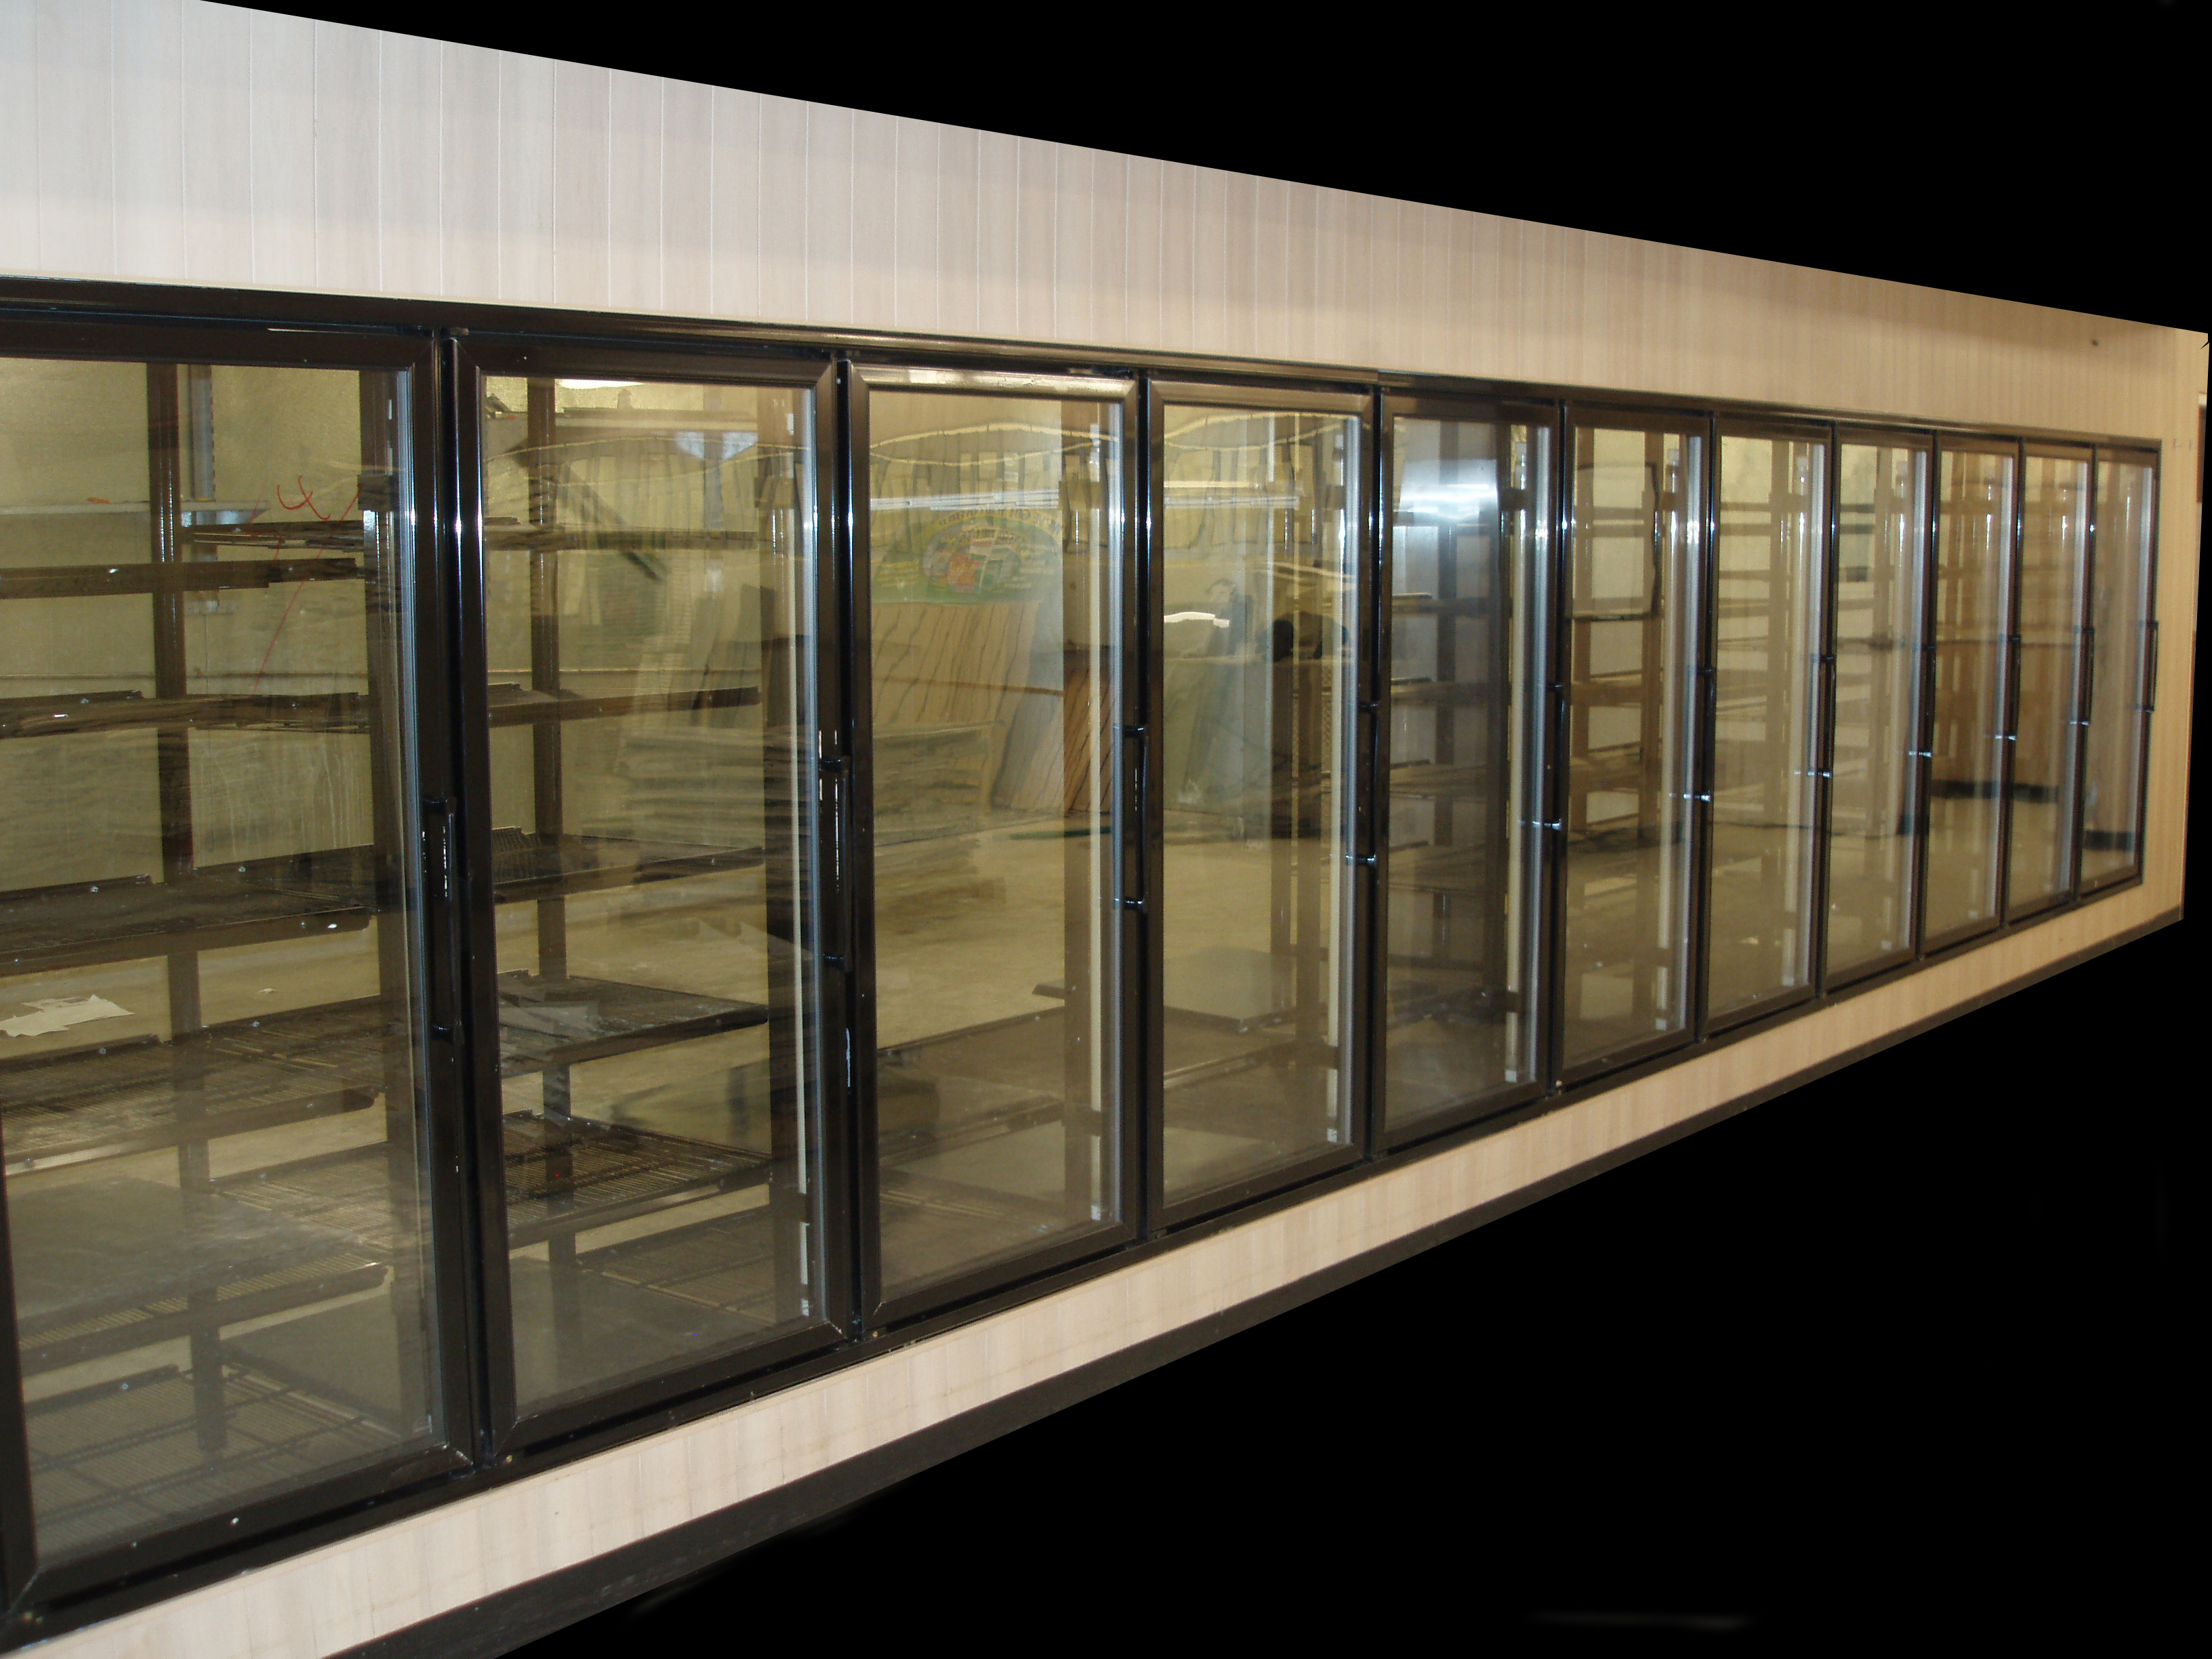 Cold/Freezer Rooms